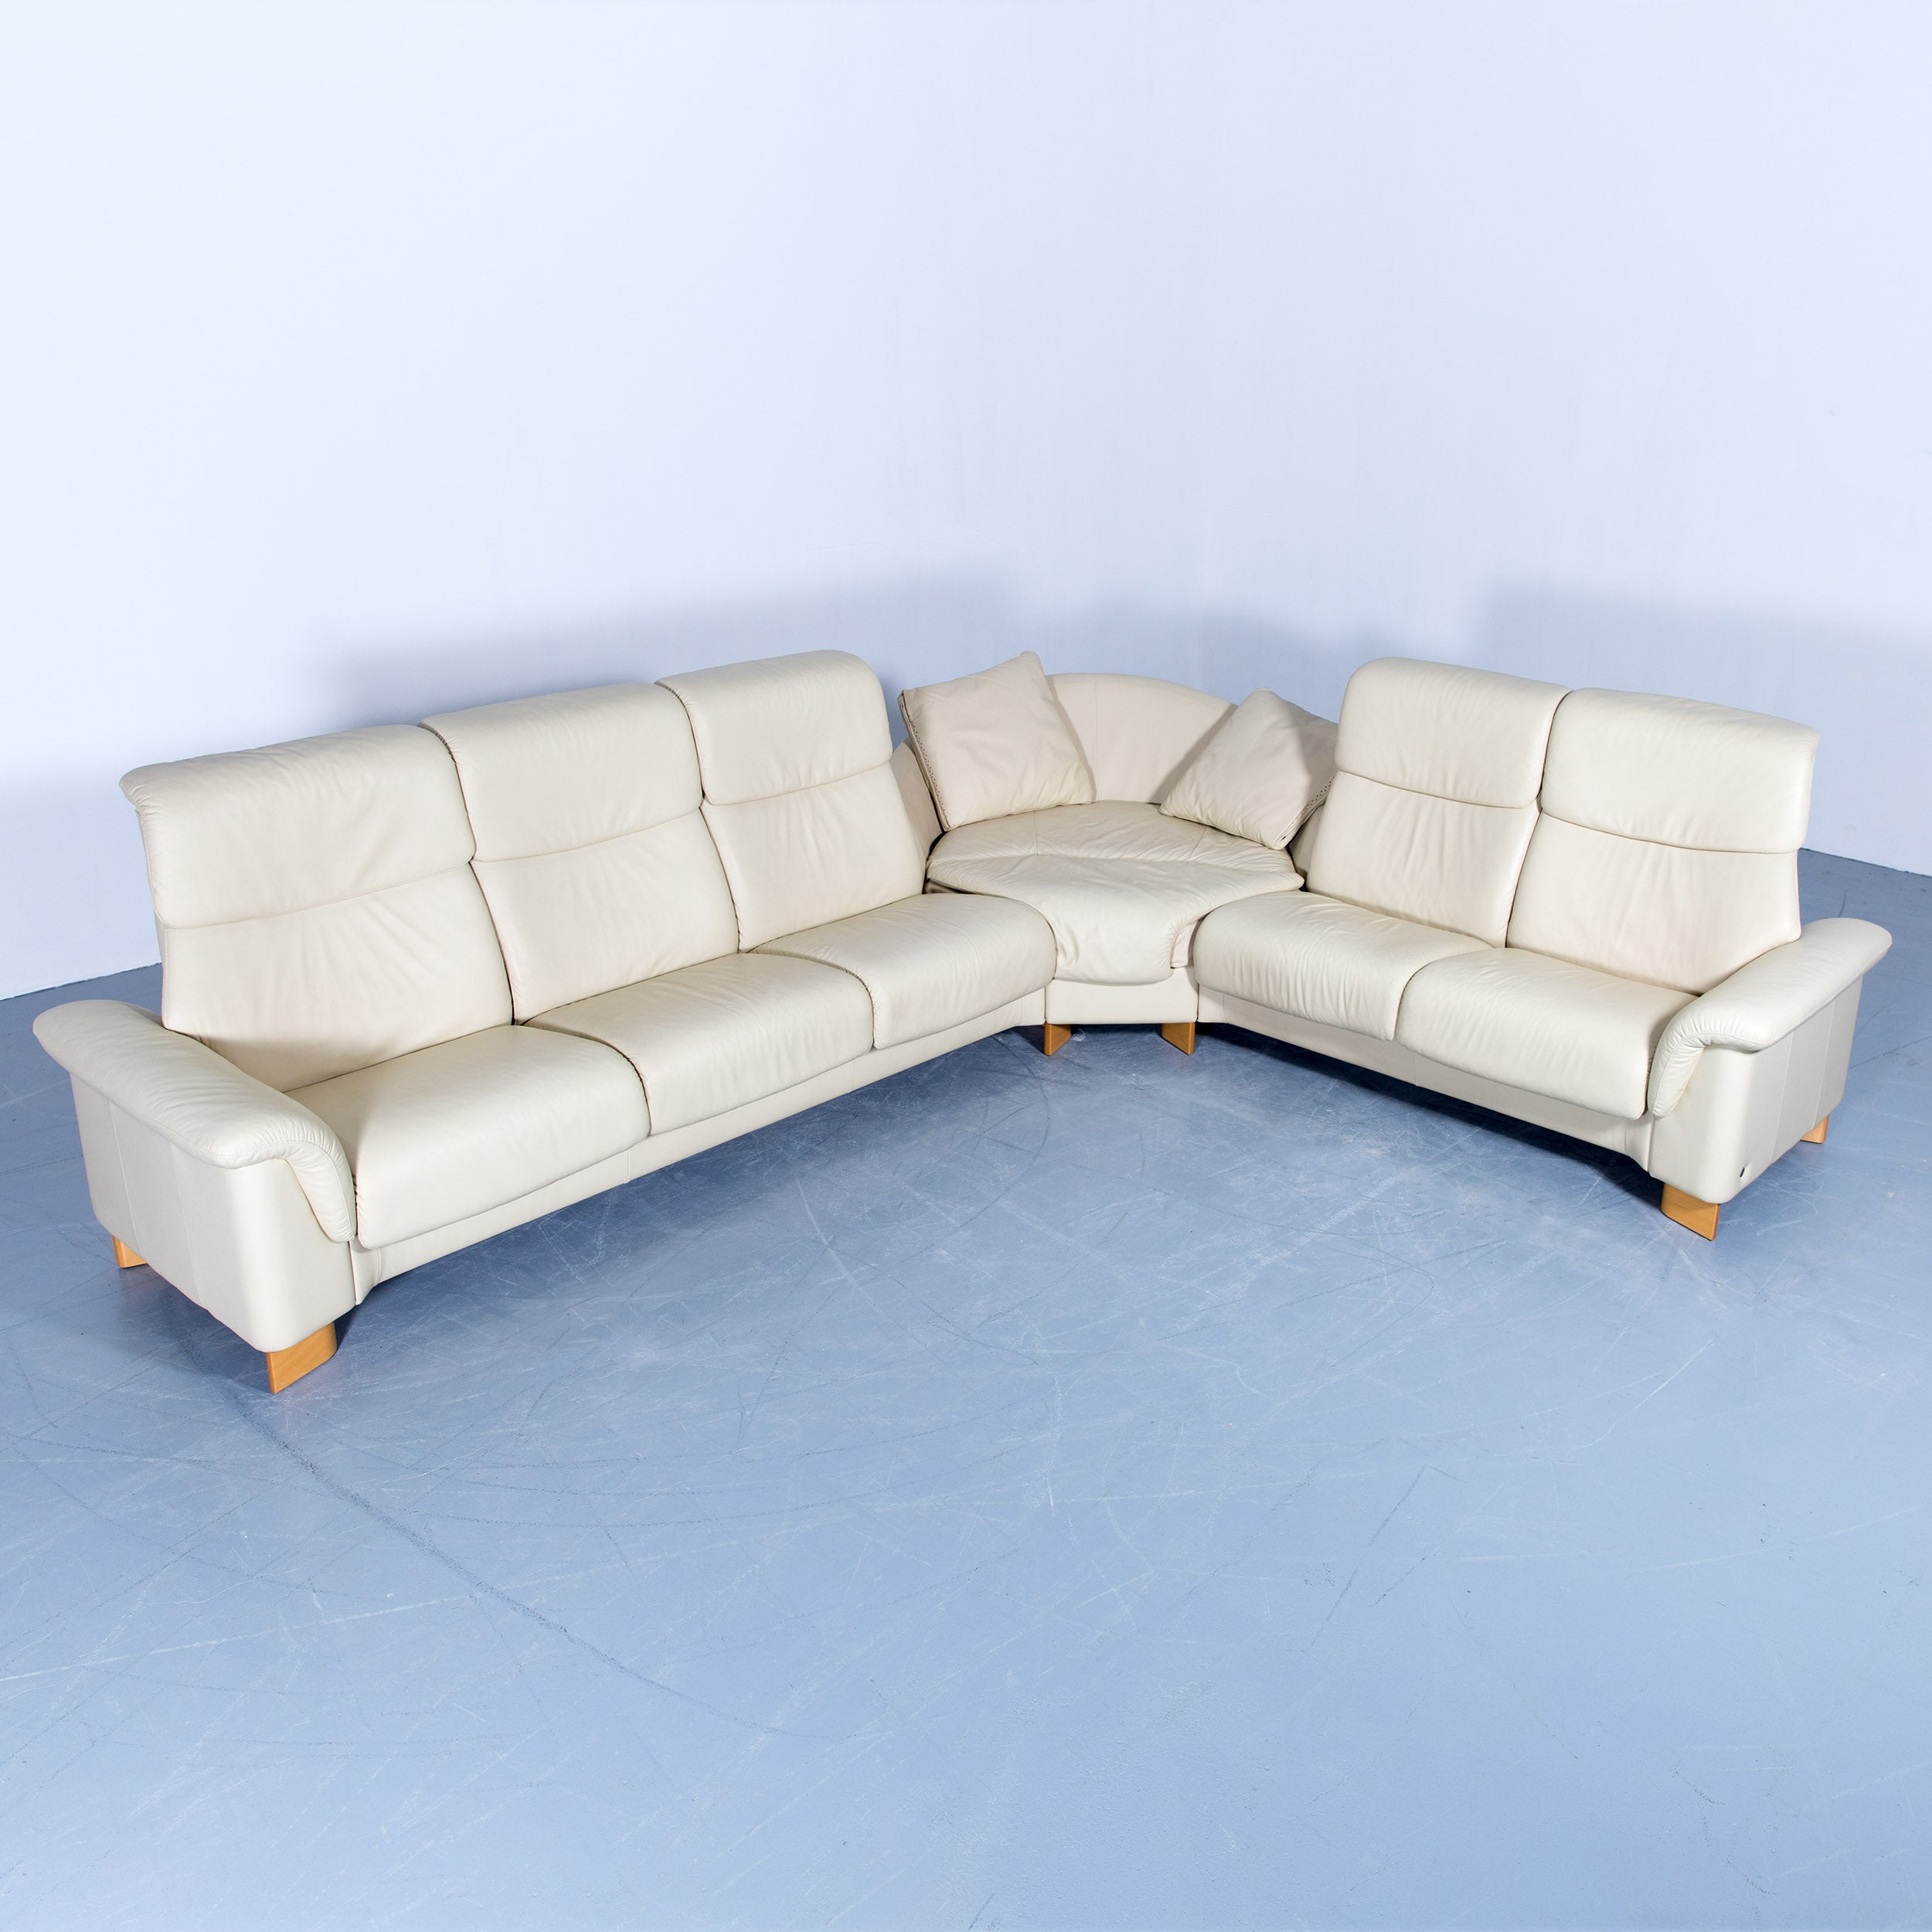 stressless paradise corner sofa. Black Bedroom Furniture Sets. Home Design Ideas